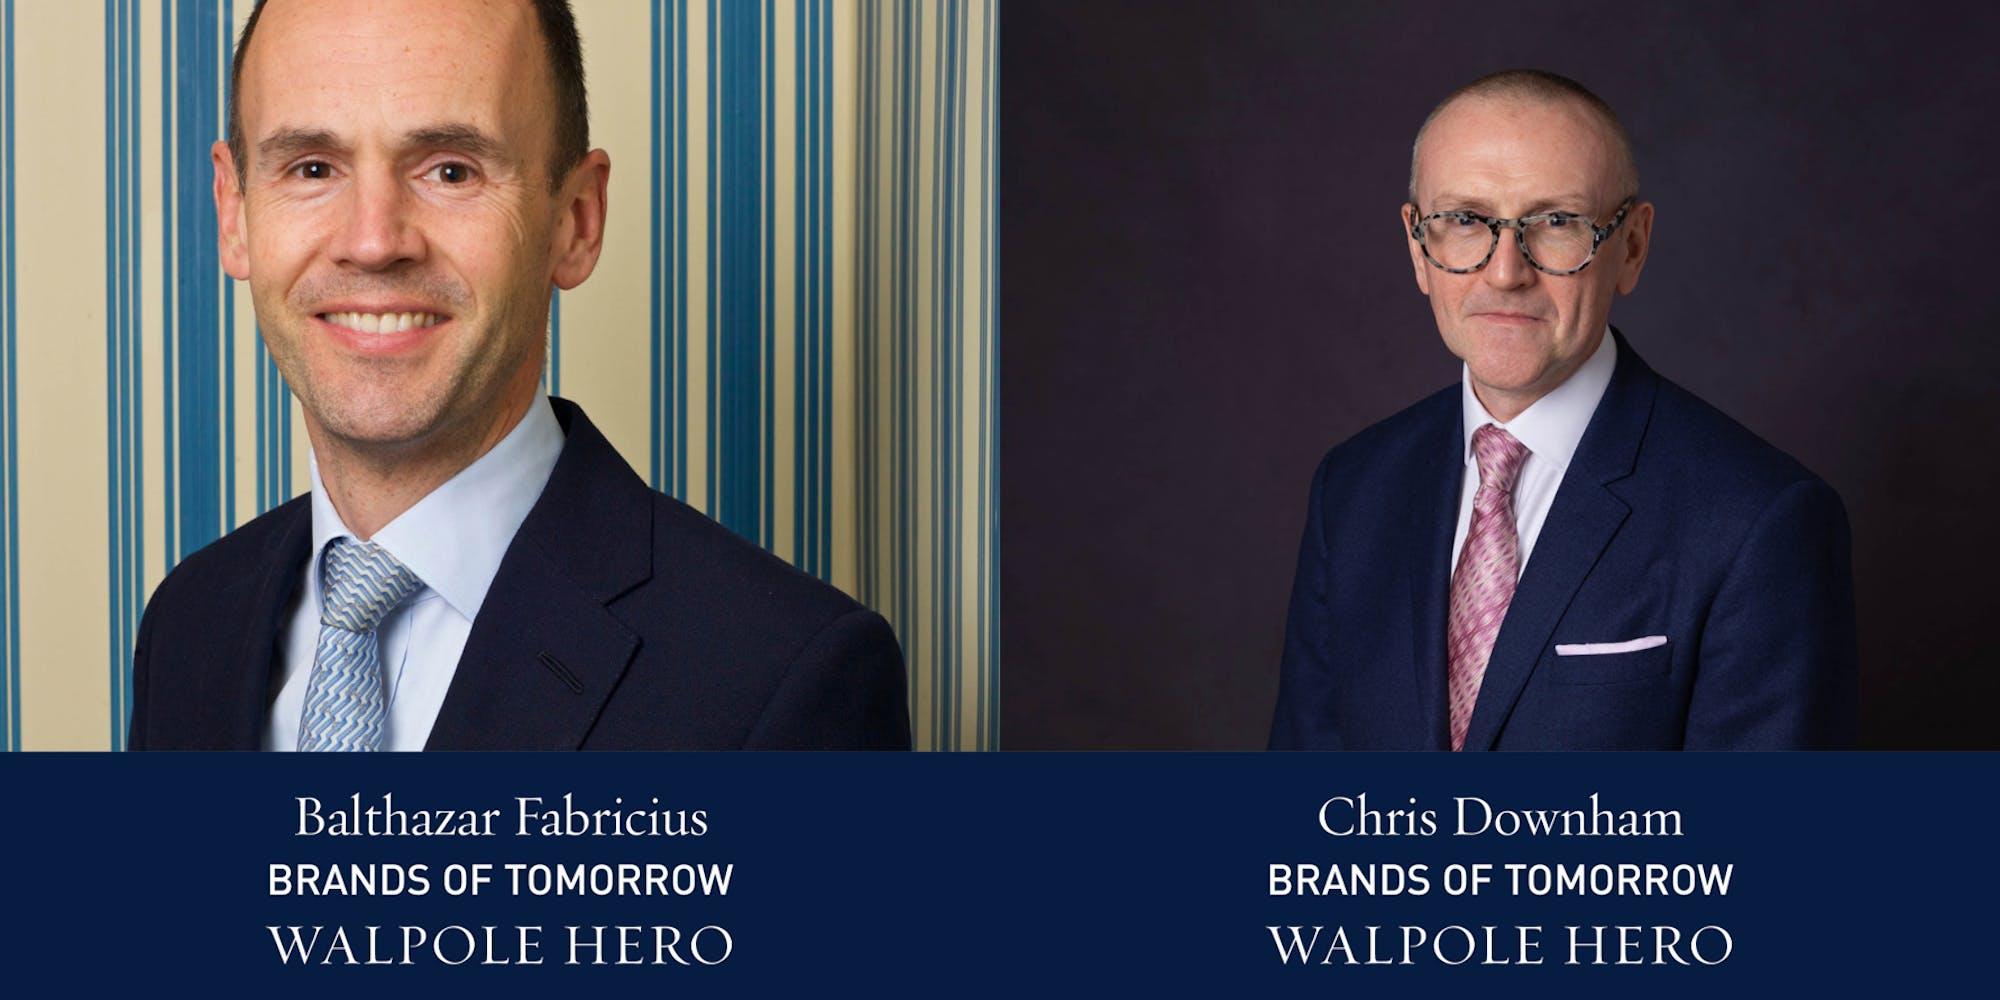 The Walpole Power List  The Heroes: Balthazar Fabricius & Chris Downham, Co-Chairs, Brands of Tomorrow